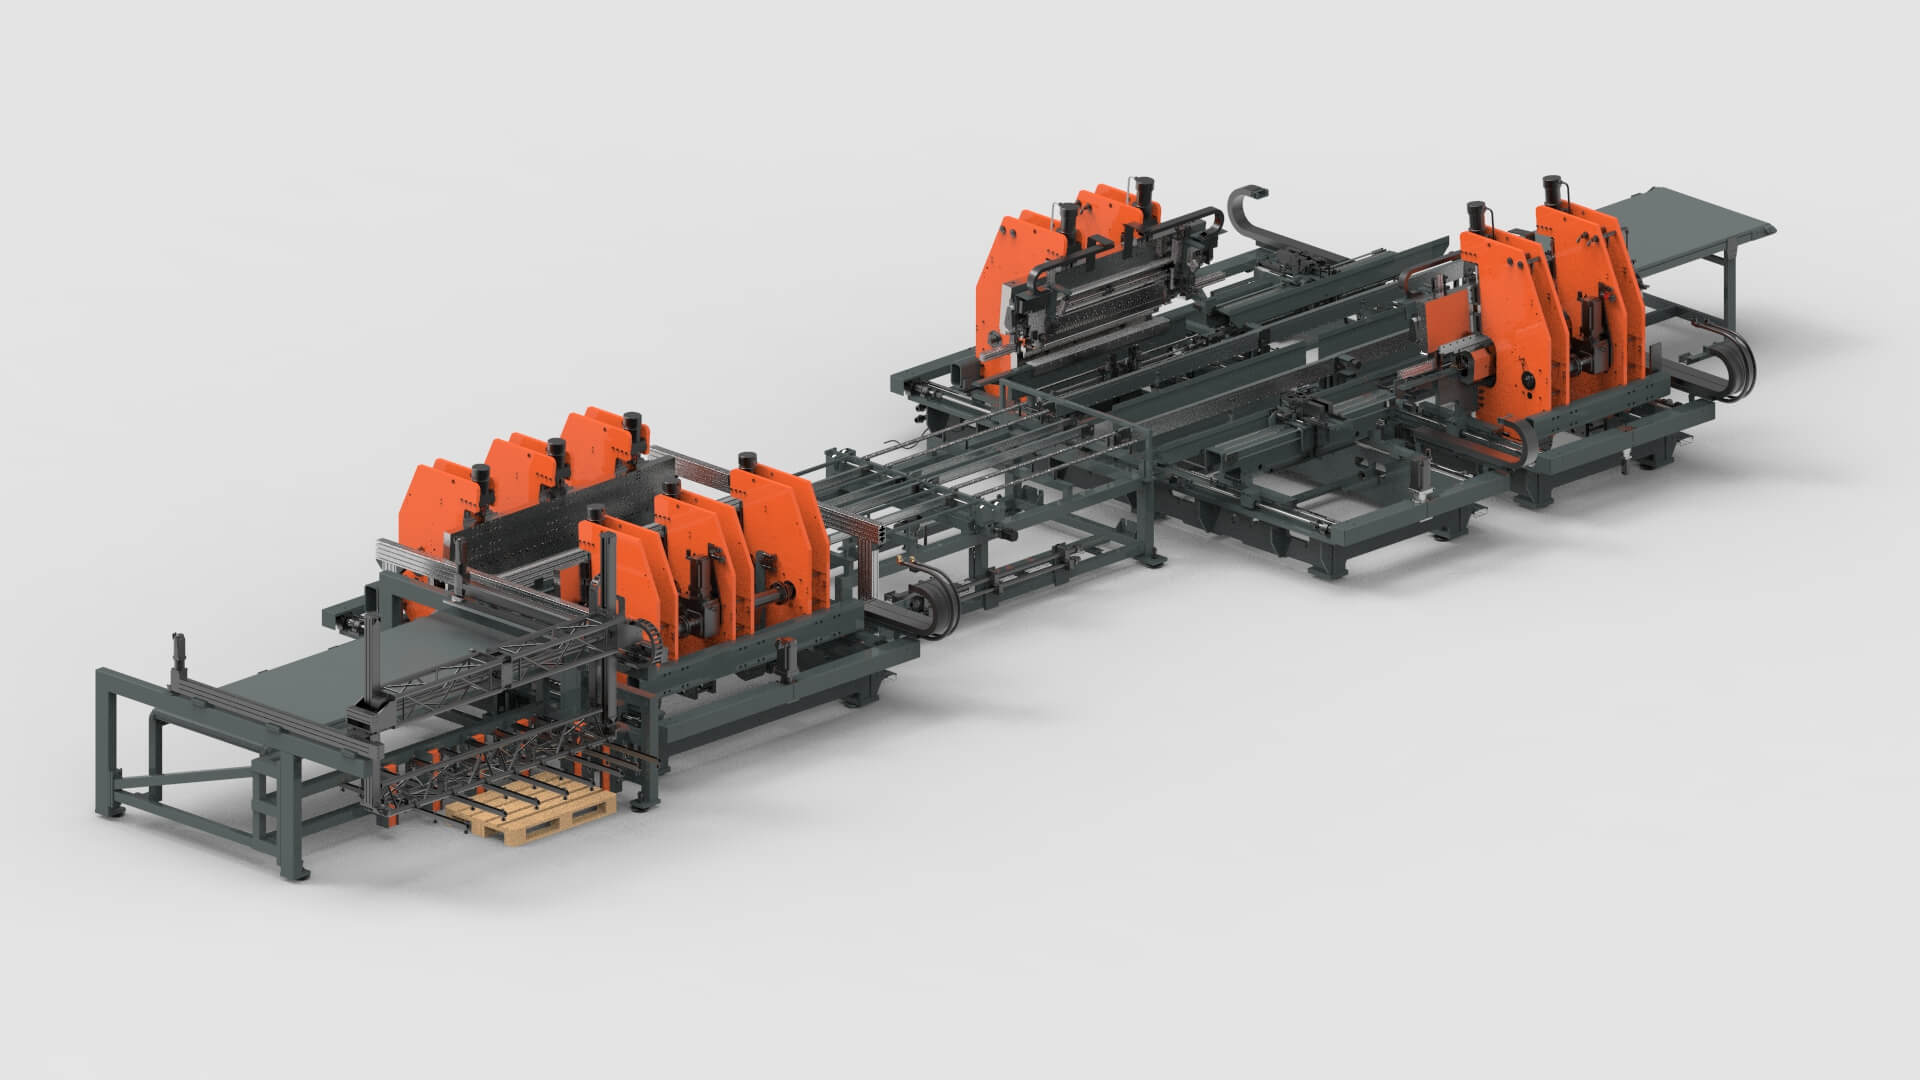 wemo-steel-cabinets-sheet-metal-bending-production-line.jpg